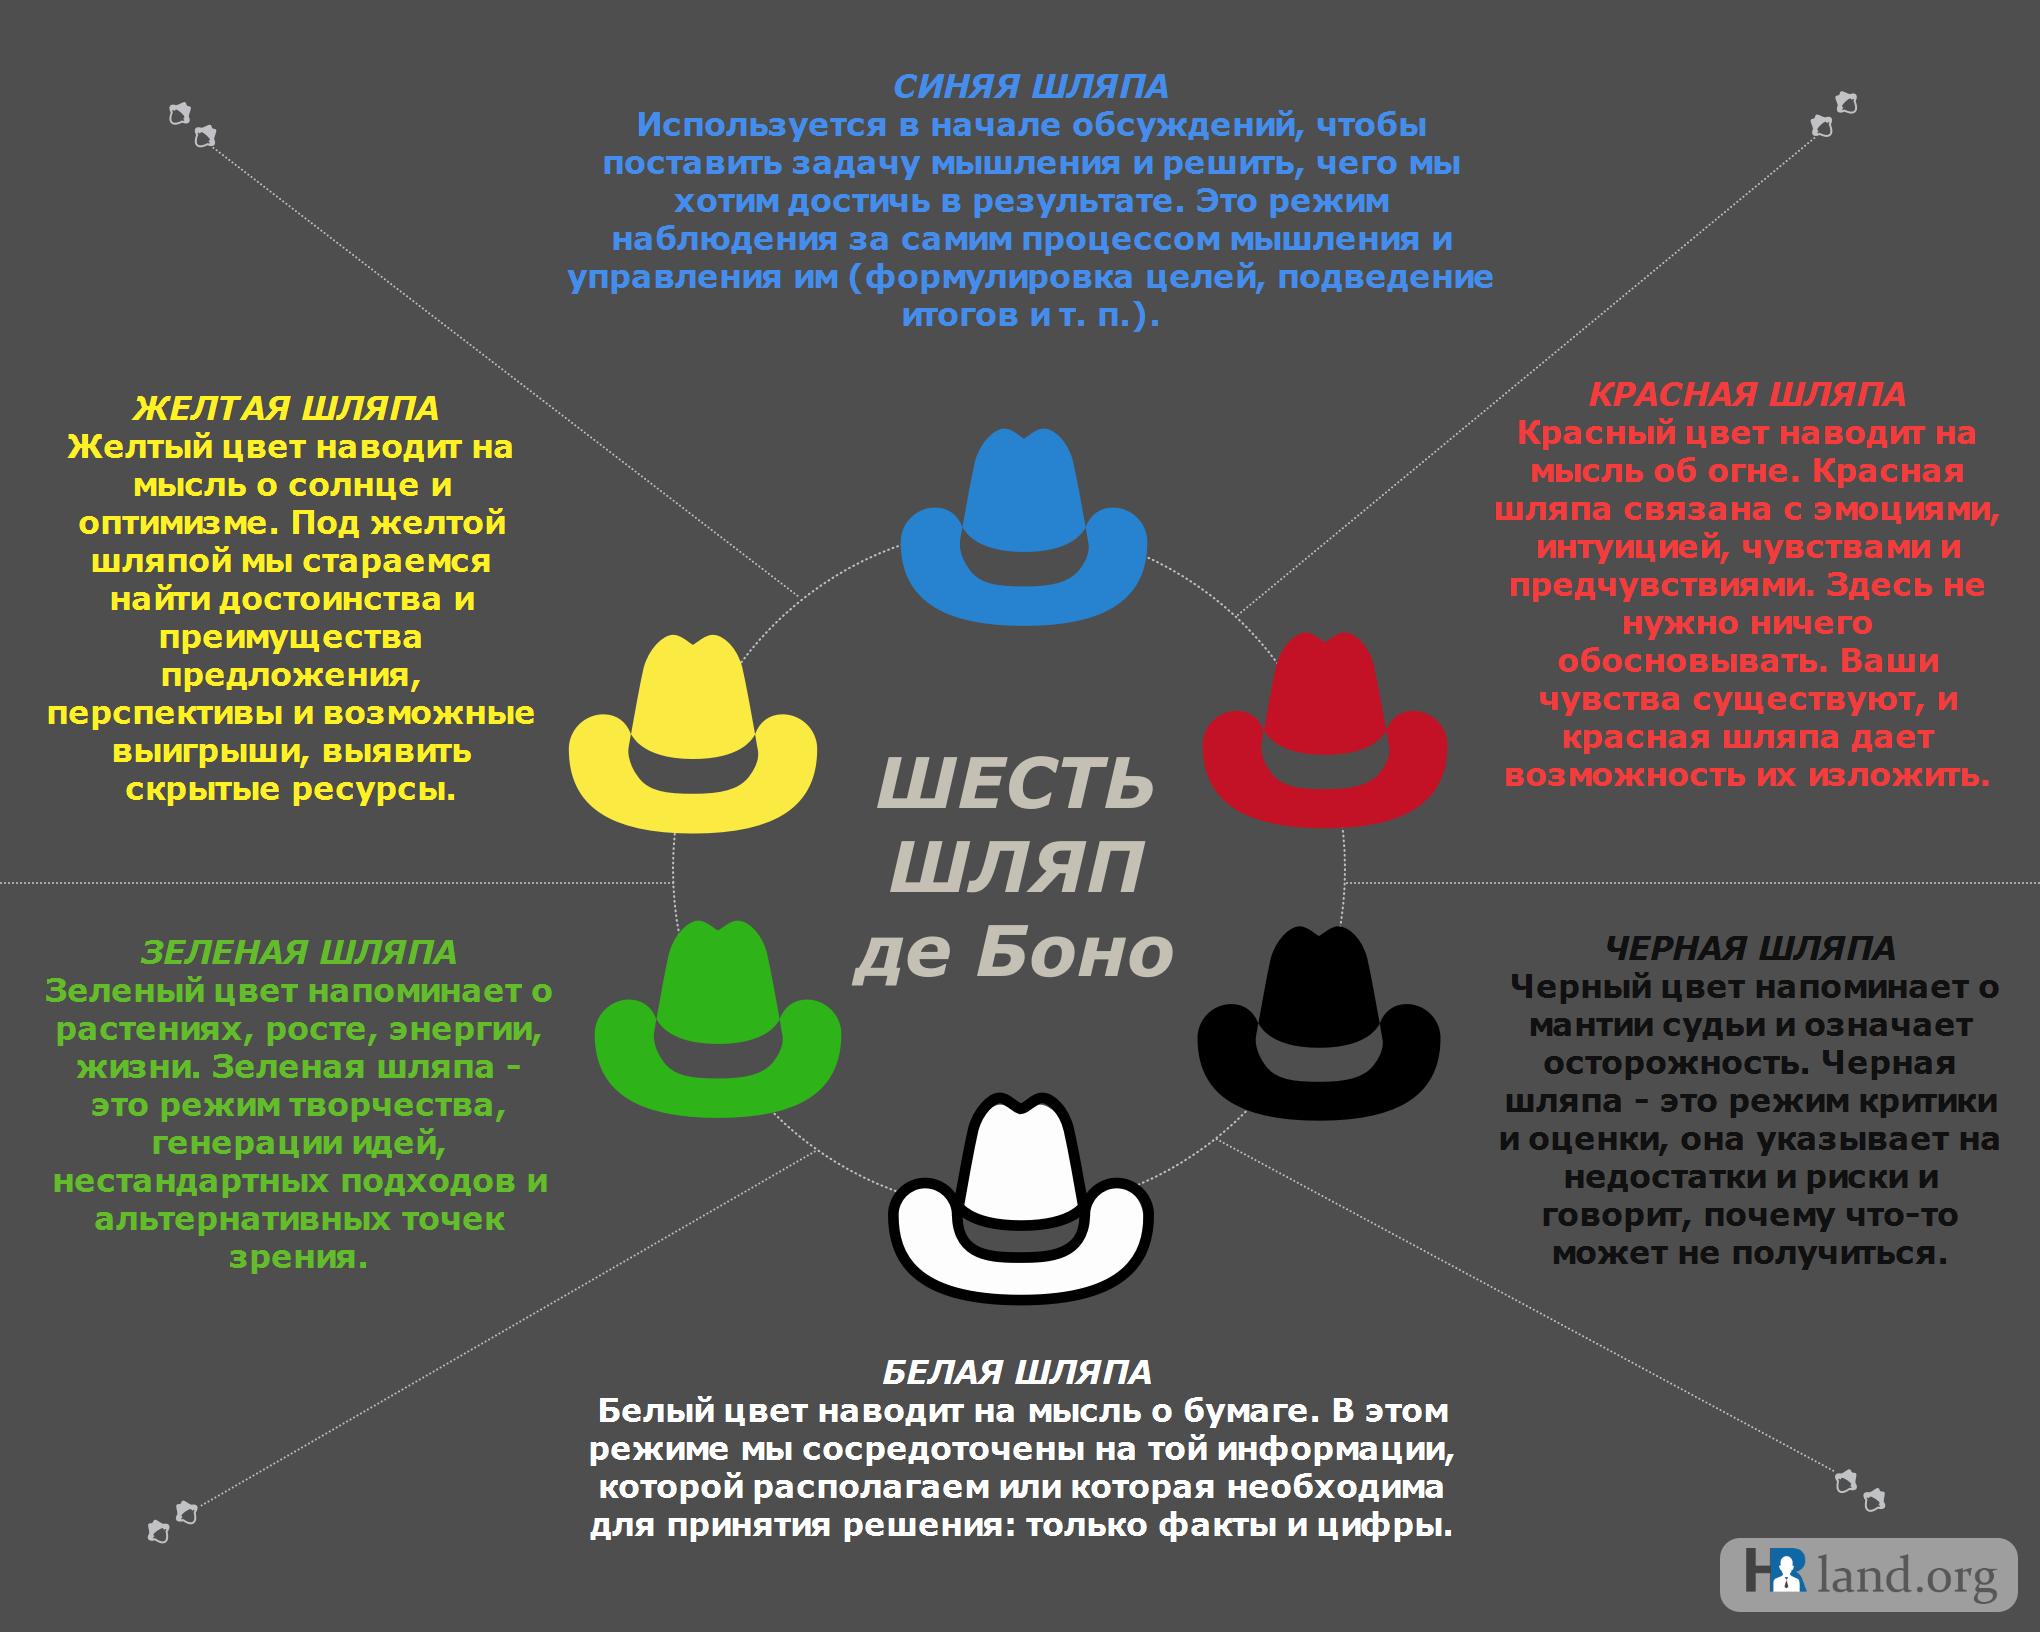 6 шляп де Боно